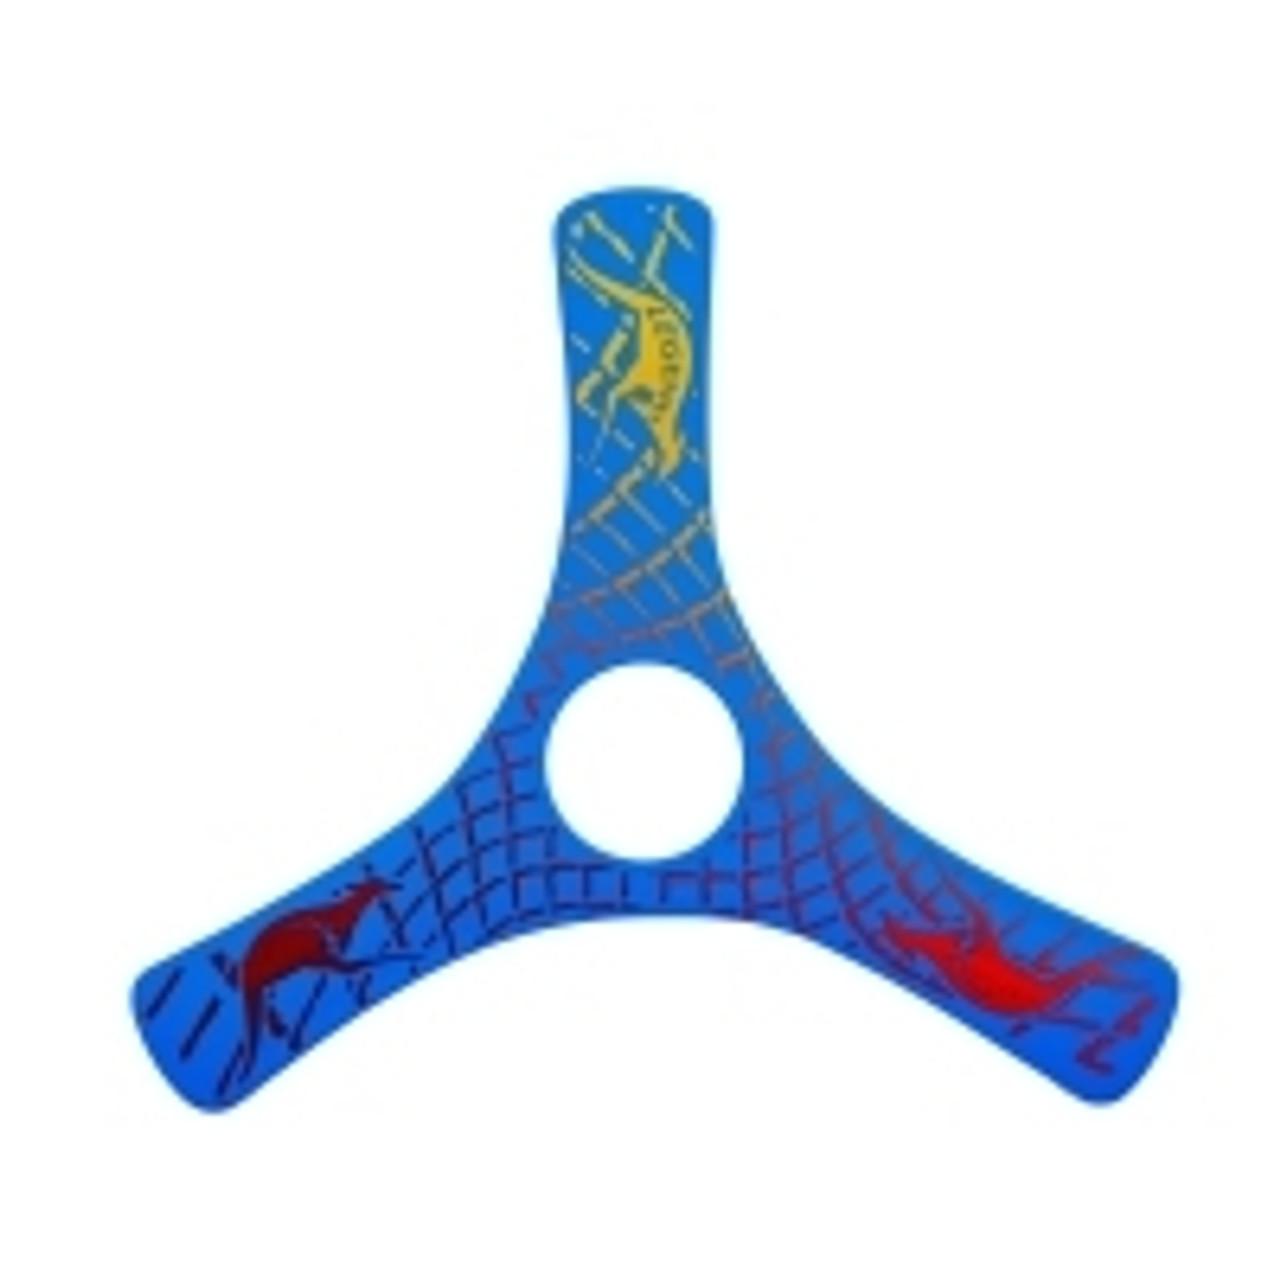 Spin Racer Boomerang